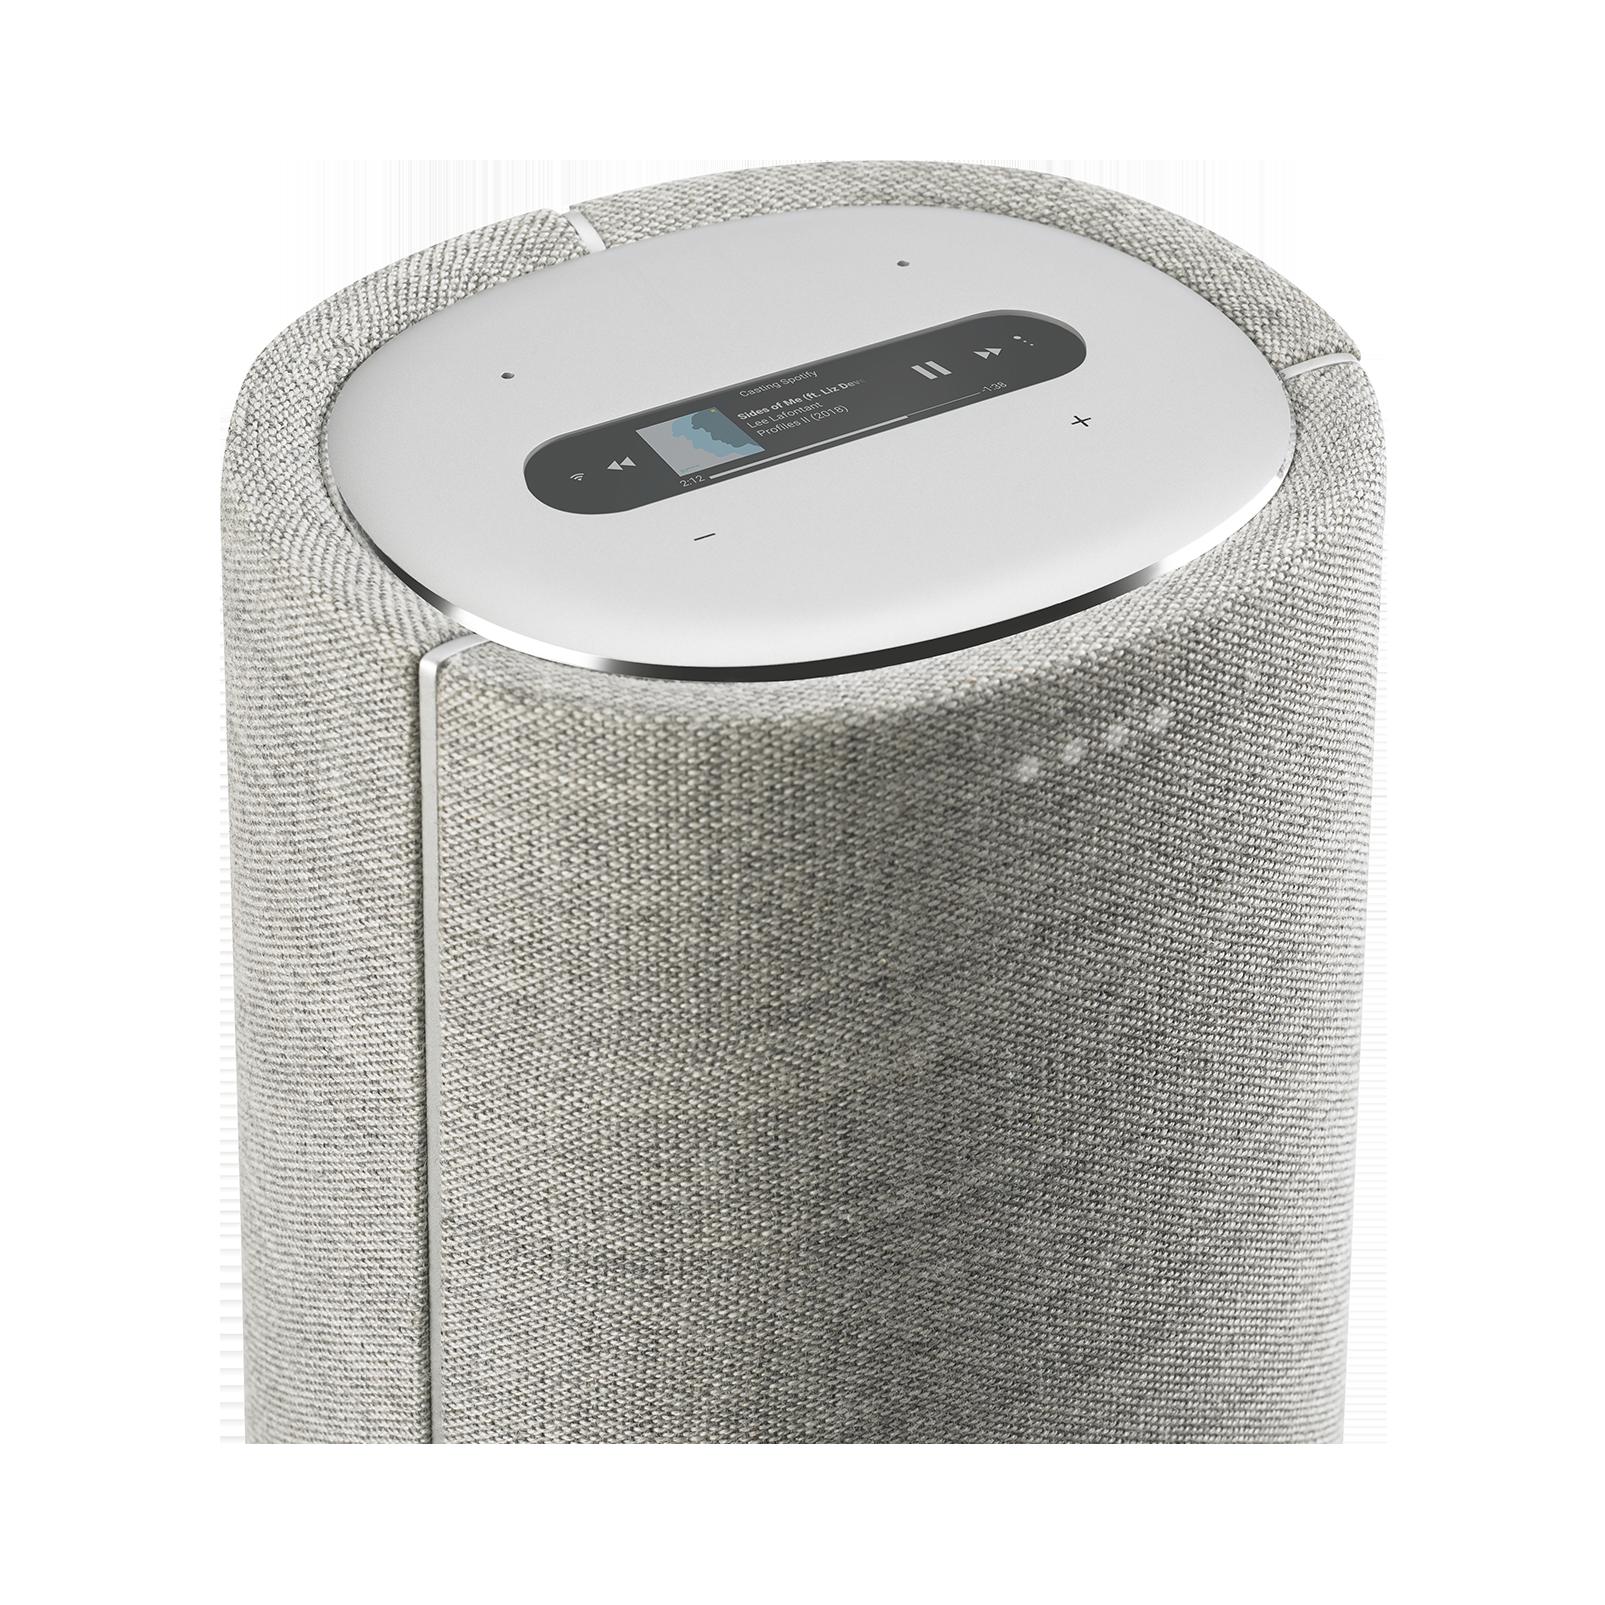 Harman Kardon Citation Tower - Grey - Smart Premium Floorstanding Speaker that delivers an impactful performance - Detailshot 1